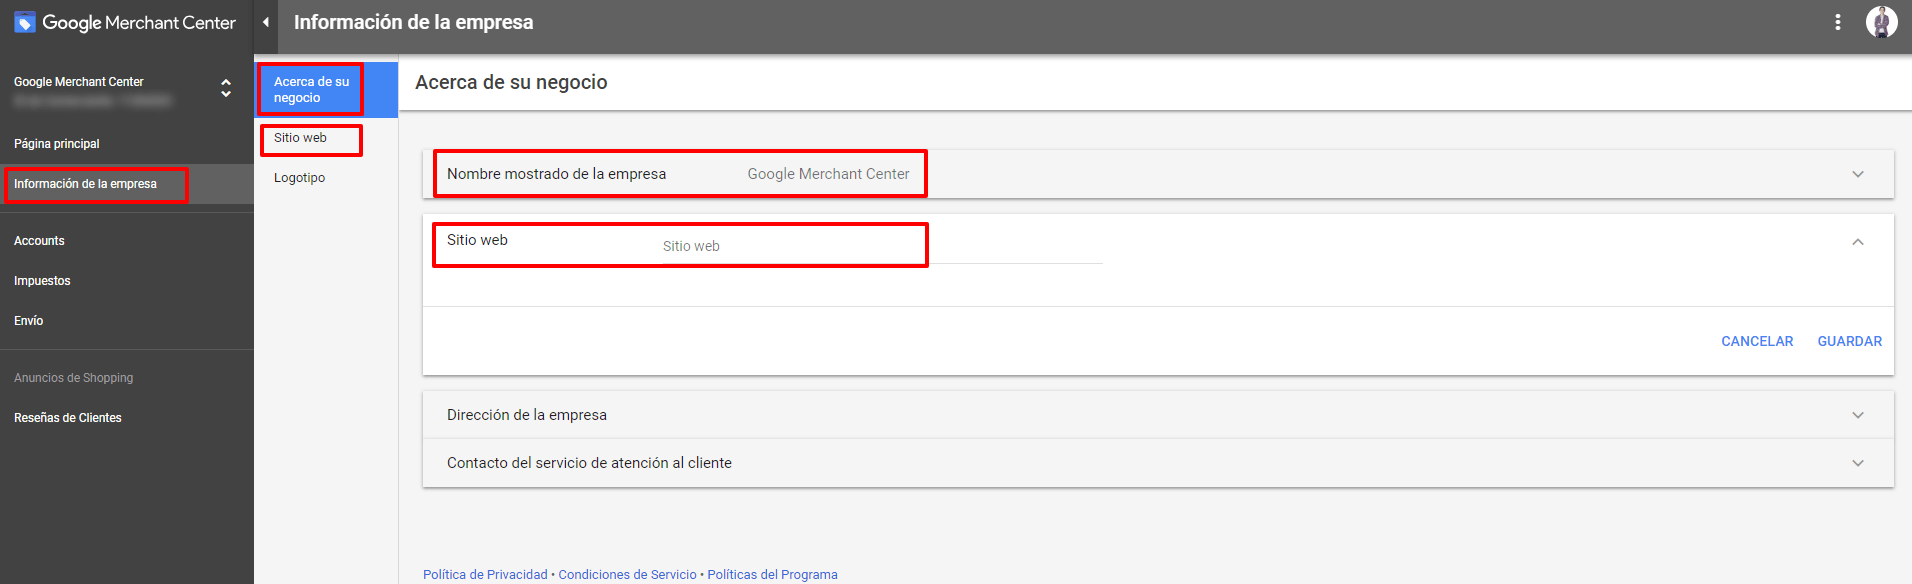 verificar-reclamar-web-mca